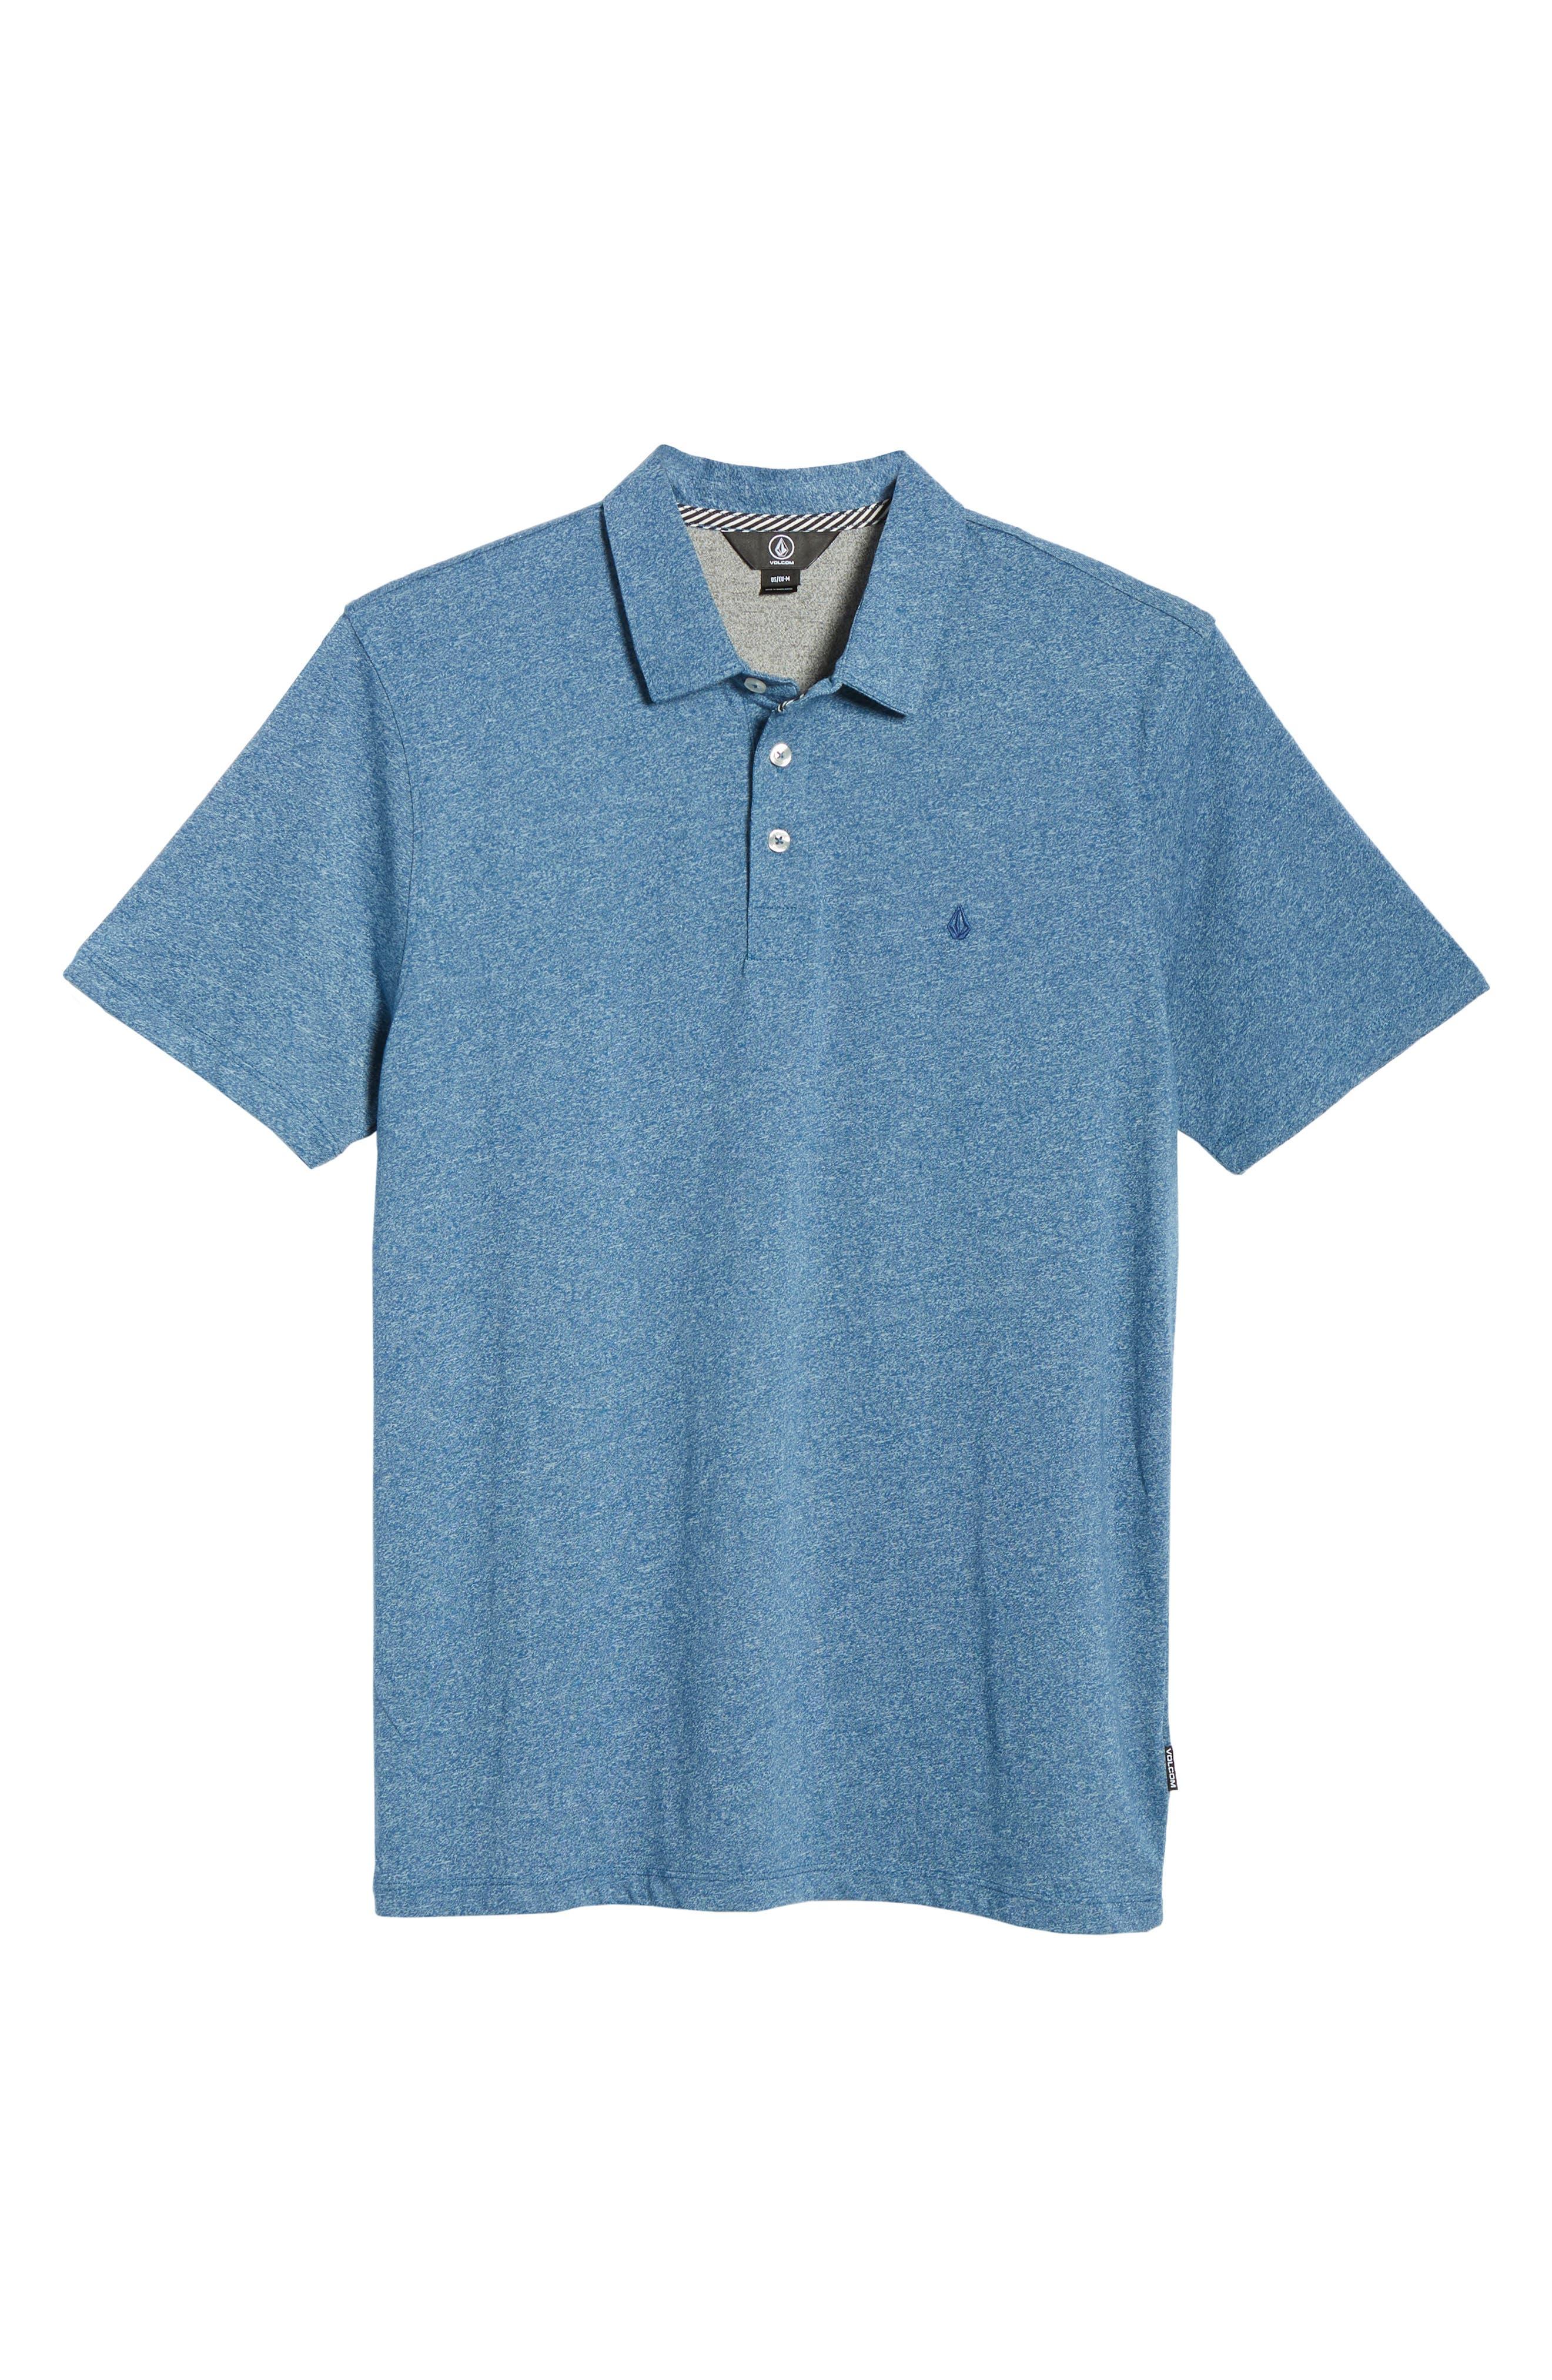 Wowzer Polo,                             Alternate thumbnail 6, color,                             BLUE VINTAGE